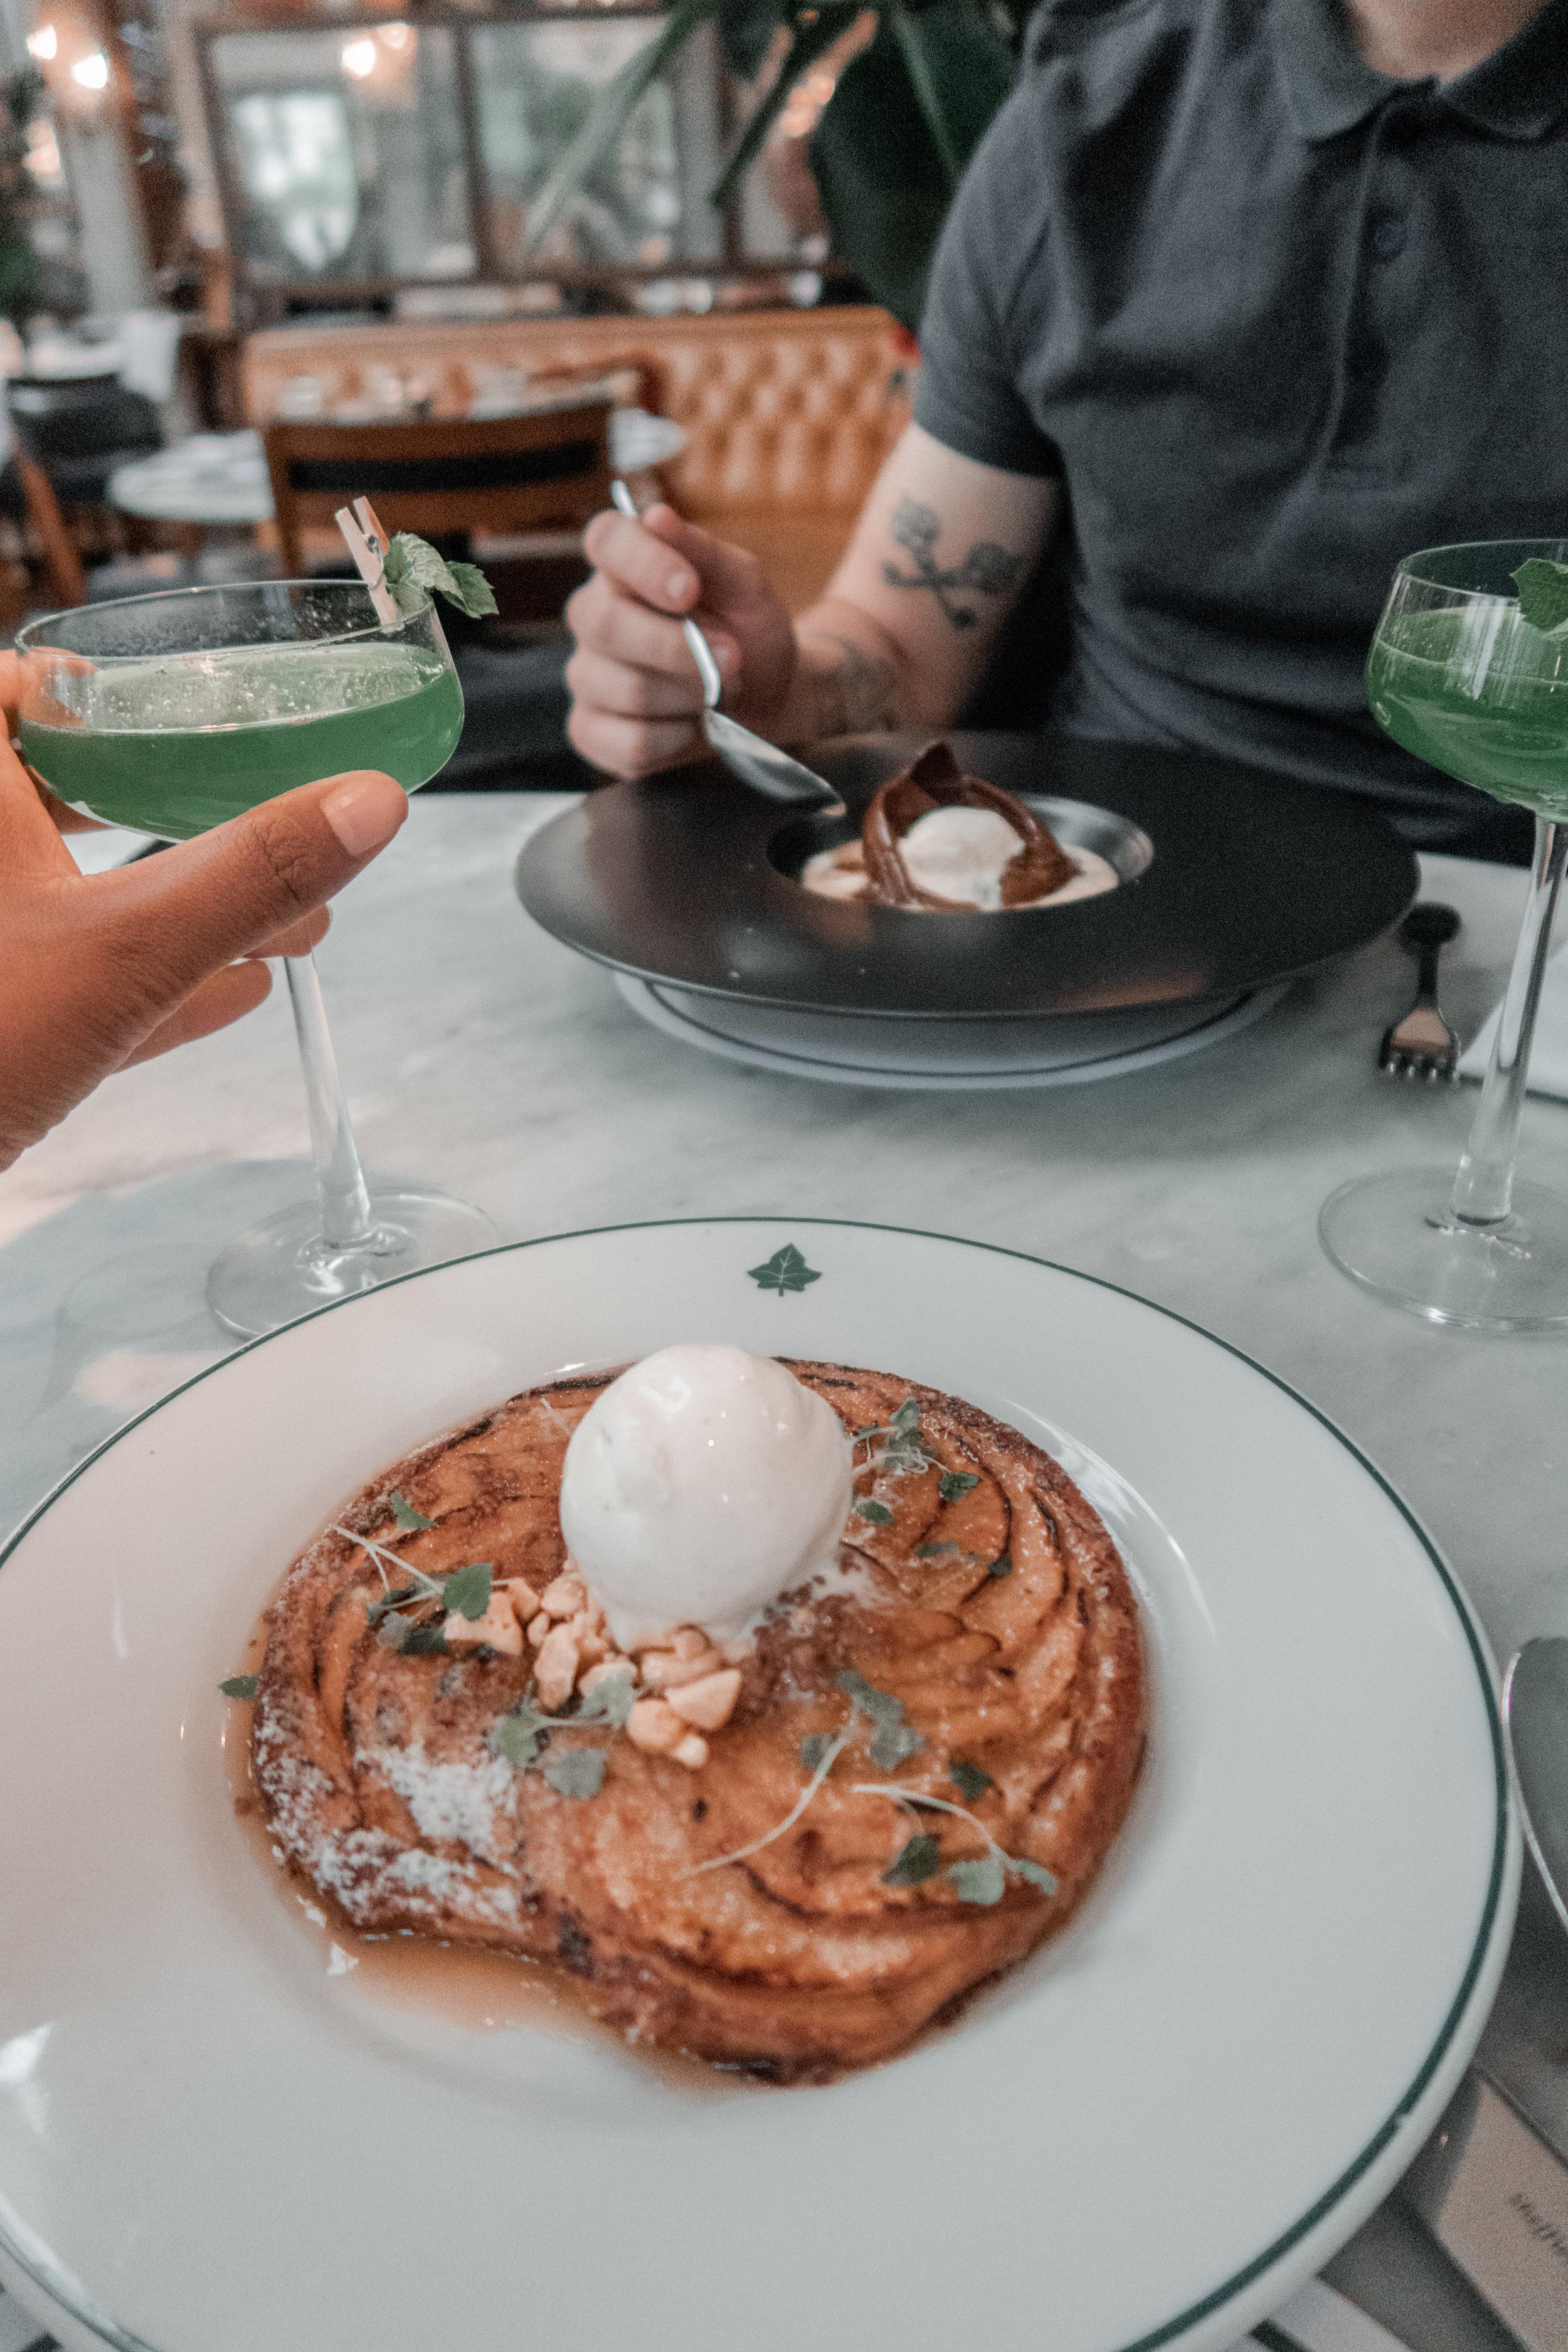 dessert menu the ivy clifton brasserie, apple tart, chocolate bomb nicole fiona serrao paul c davies